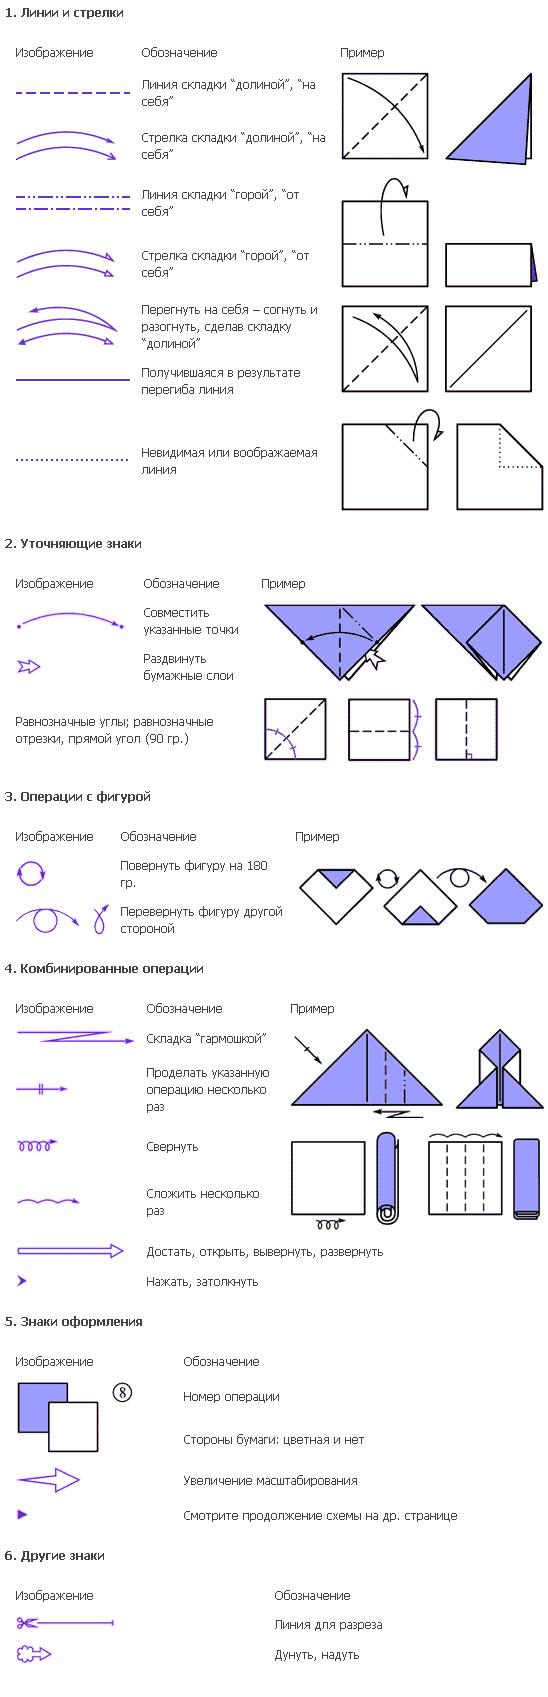 Описание: C:\Documents and Settings\Леночка\Мои документы\Мои рисунки\Новая папка\podelki-origami-novye1.jpg